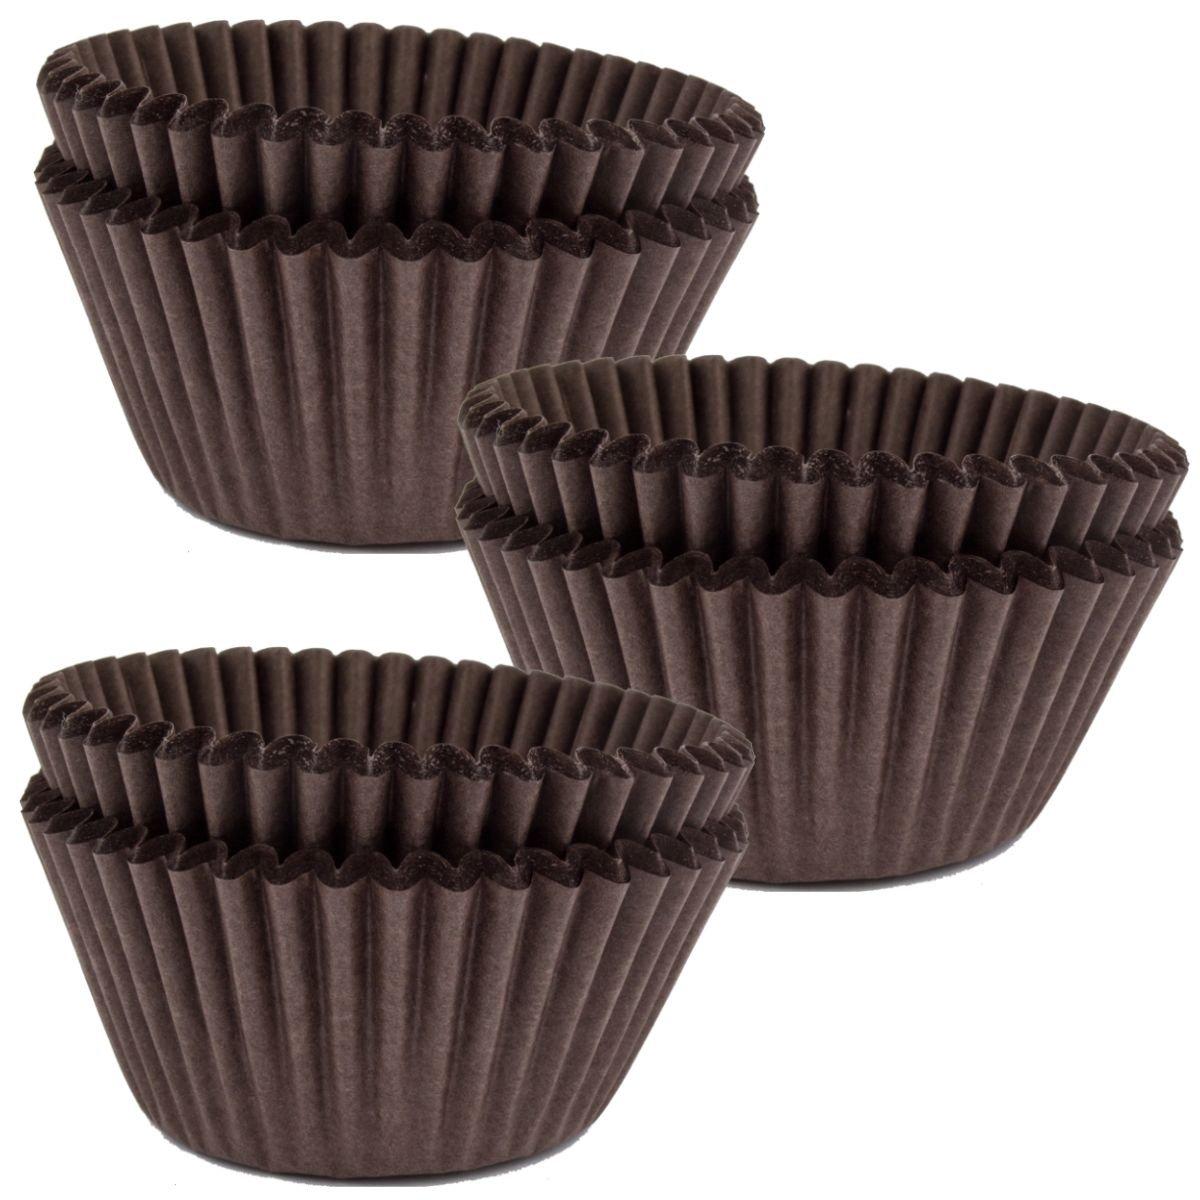 High Quality Paper Muffin, Cupcake Cases - Plain Colours - Triple Packs (Black) Culpitt